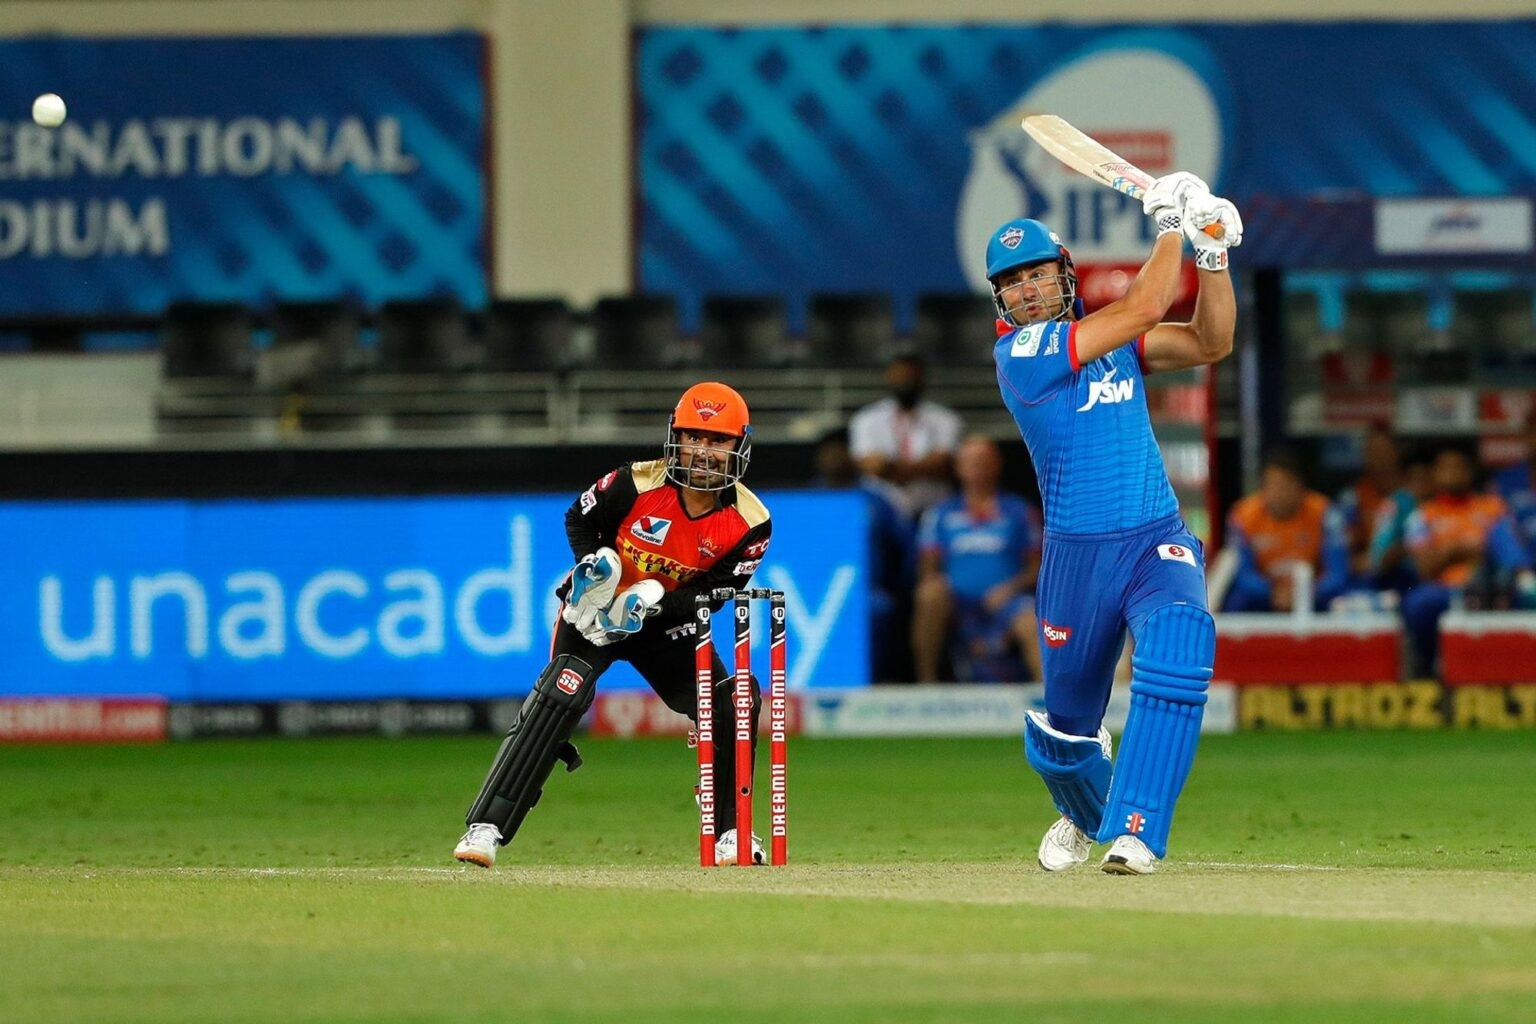 DCvsSRH: শ্রেয়স আইয়ারের এই ভুল ডোবাল দলকে, হায়দ্রাবাদ জিতল ৮৮ রানে 2